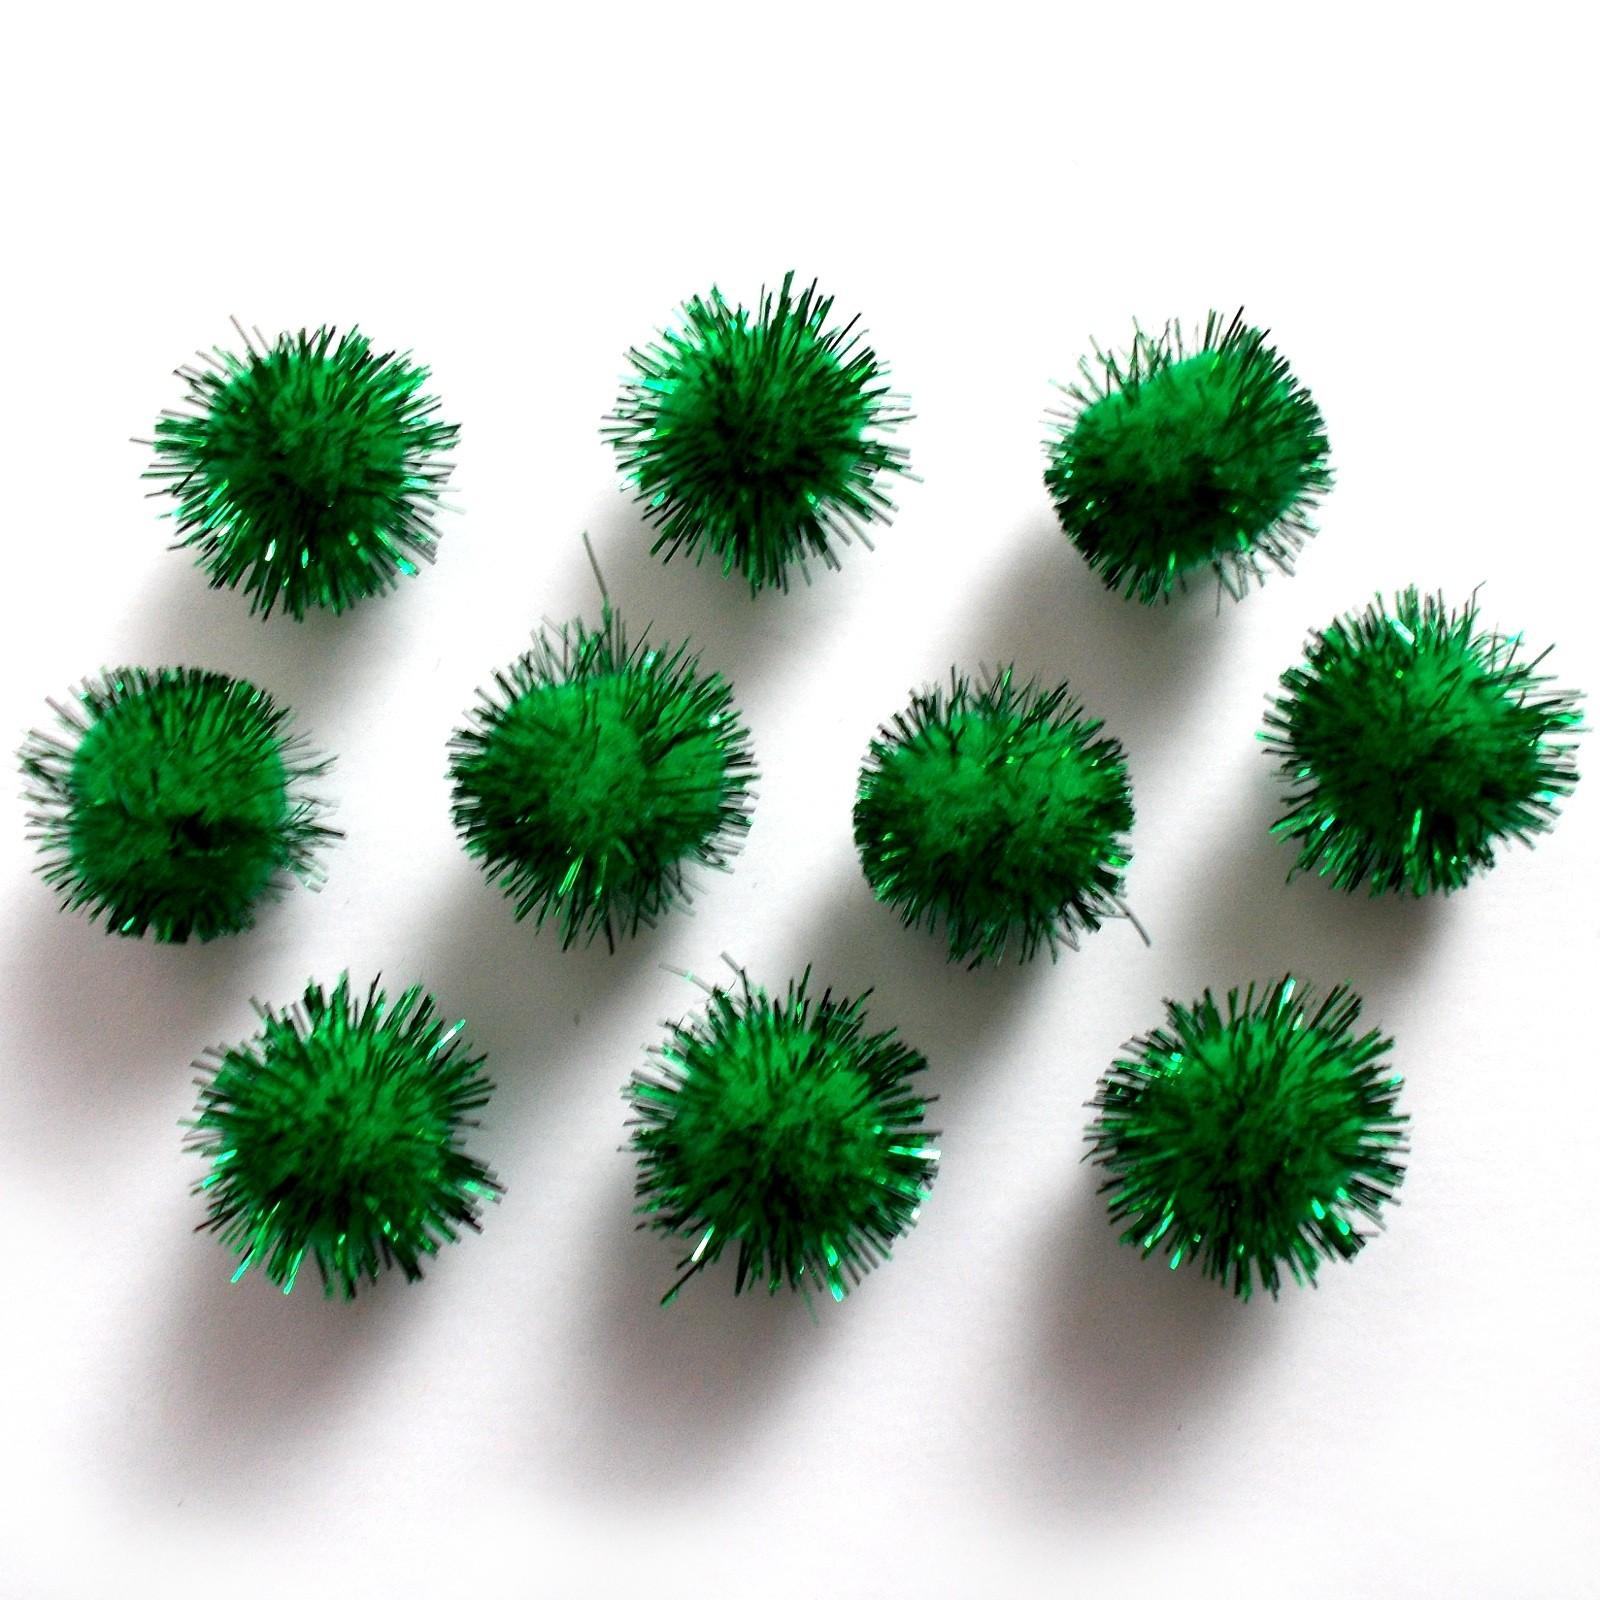 Metallic Pom Poms 13mm Green Pack of 10